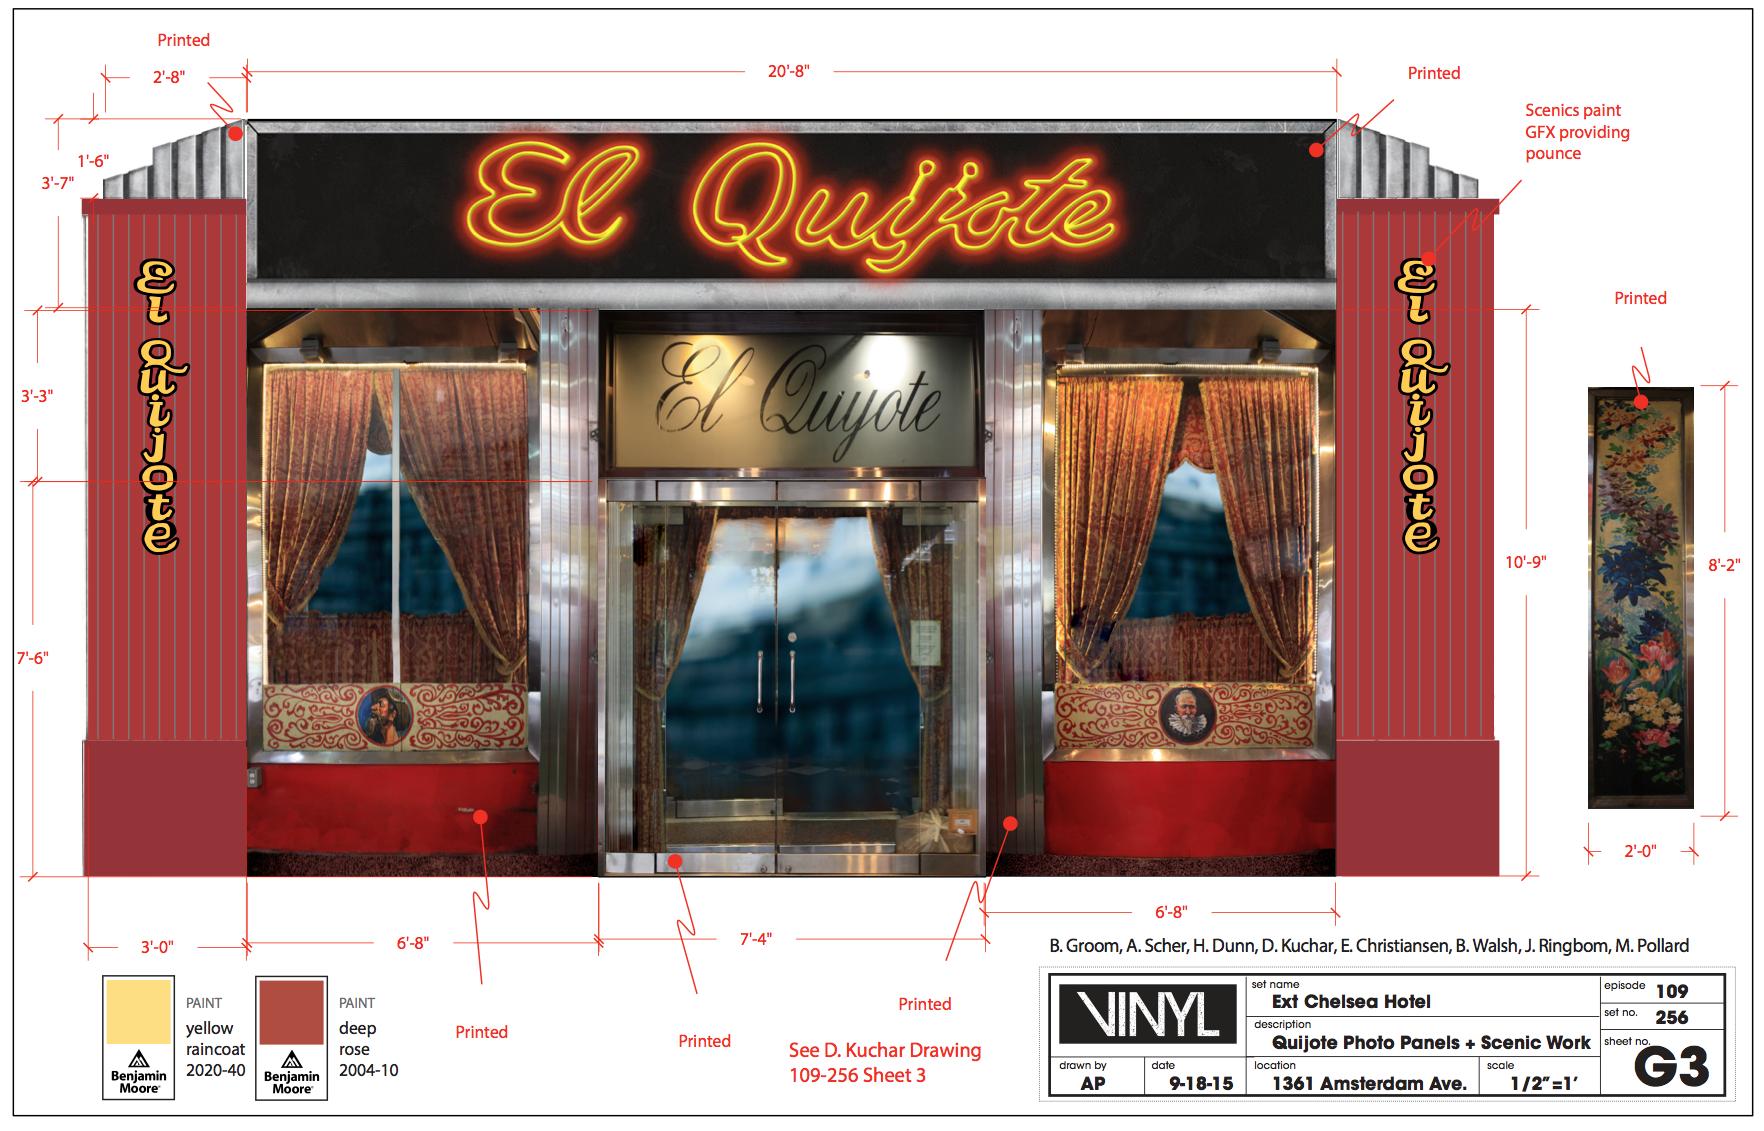 El Quijote Printed Scenery